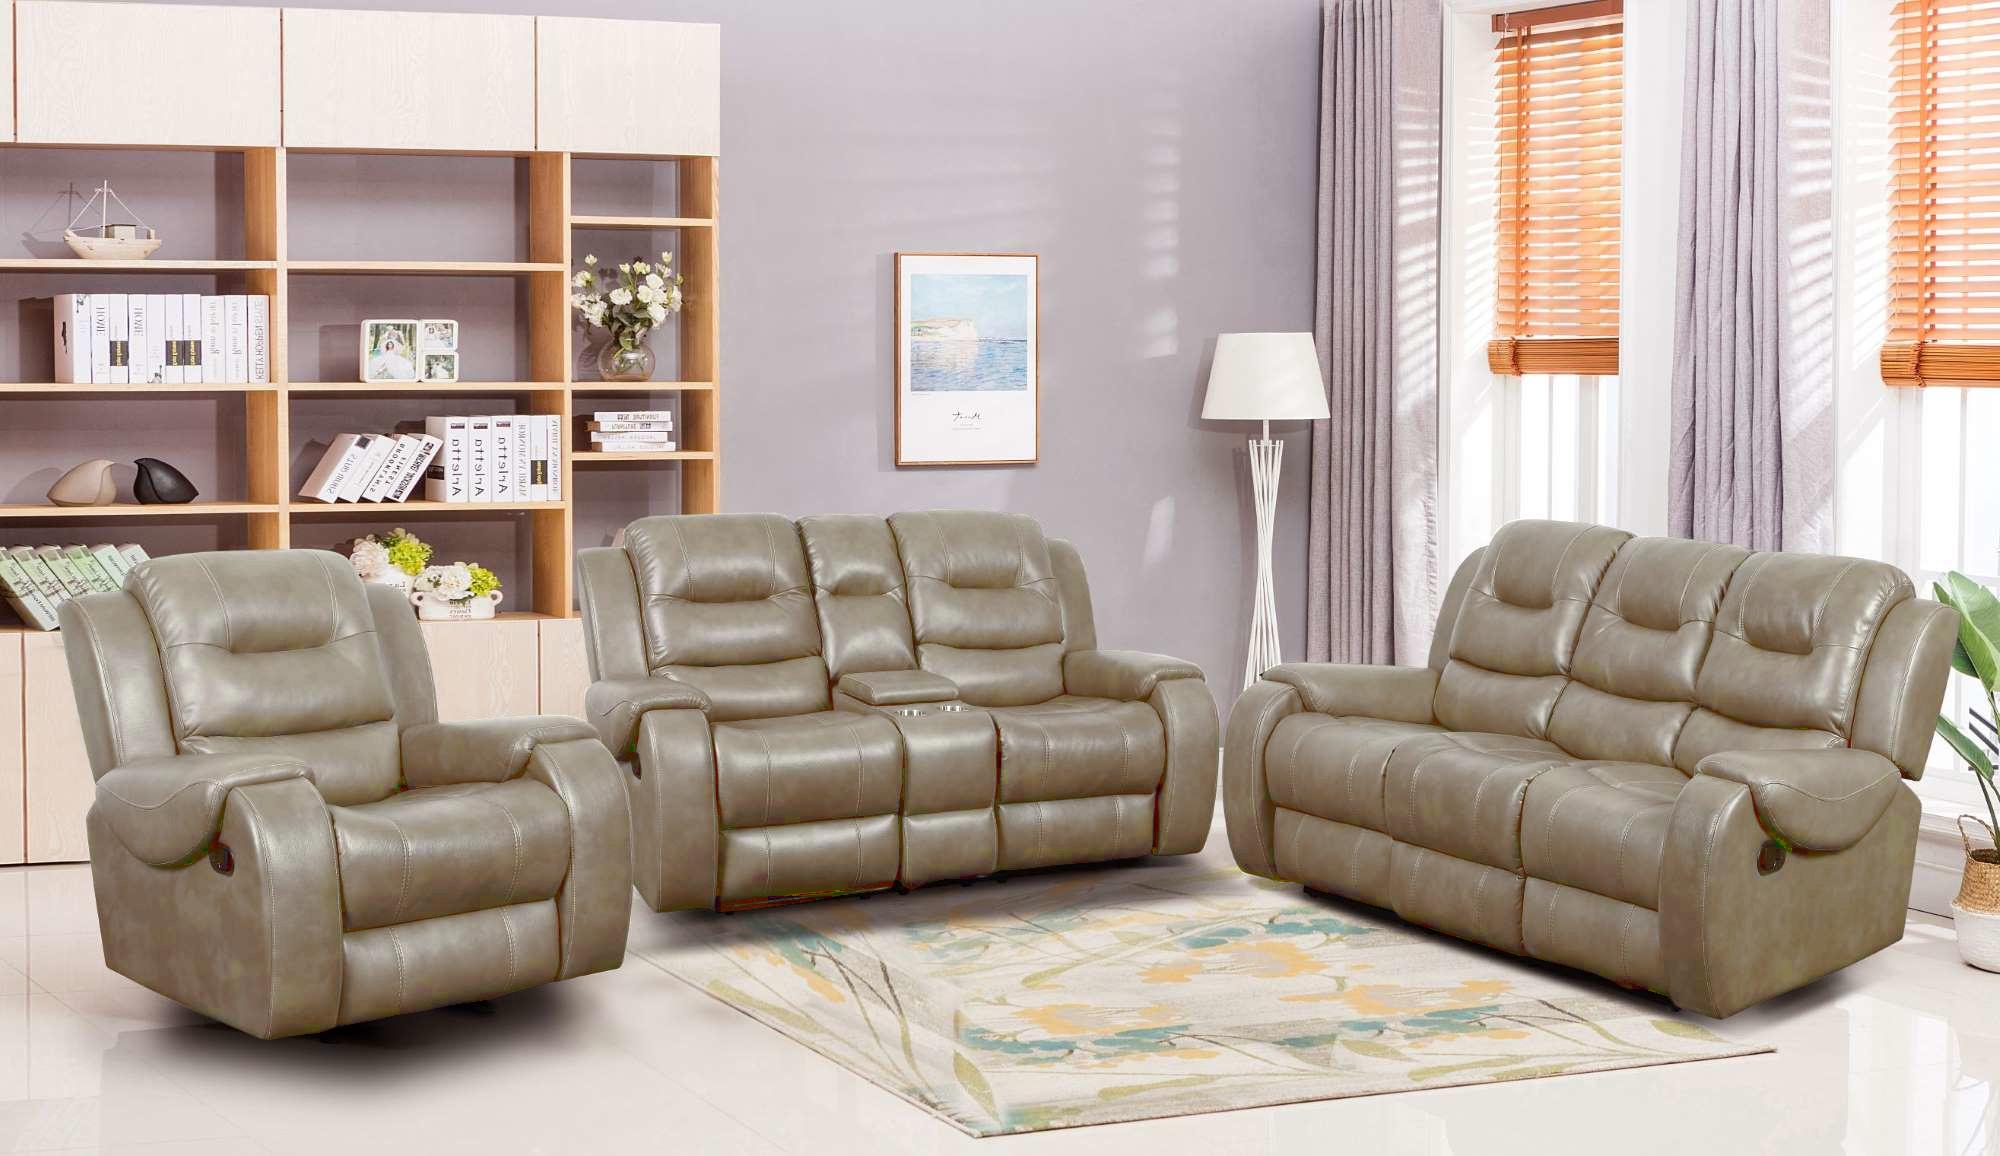 Reclining sofa and Loveseat Set LRPX2908MU Jasper Mushroom